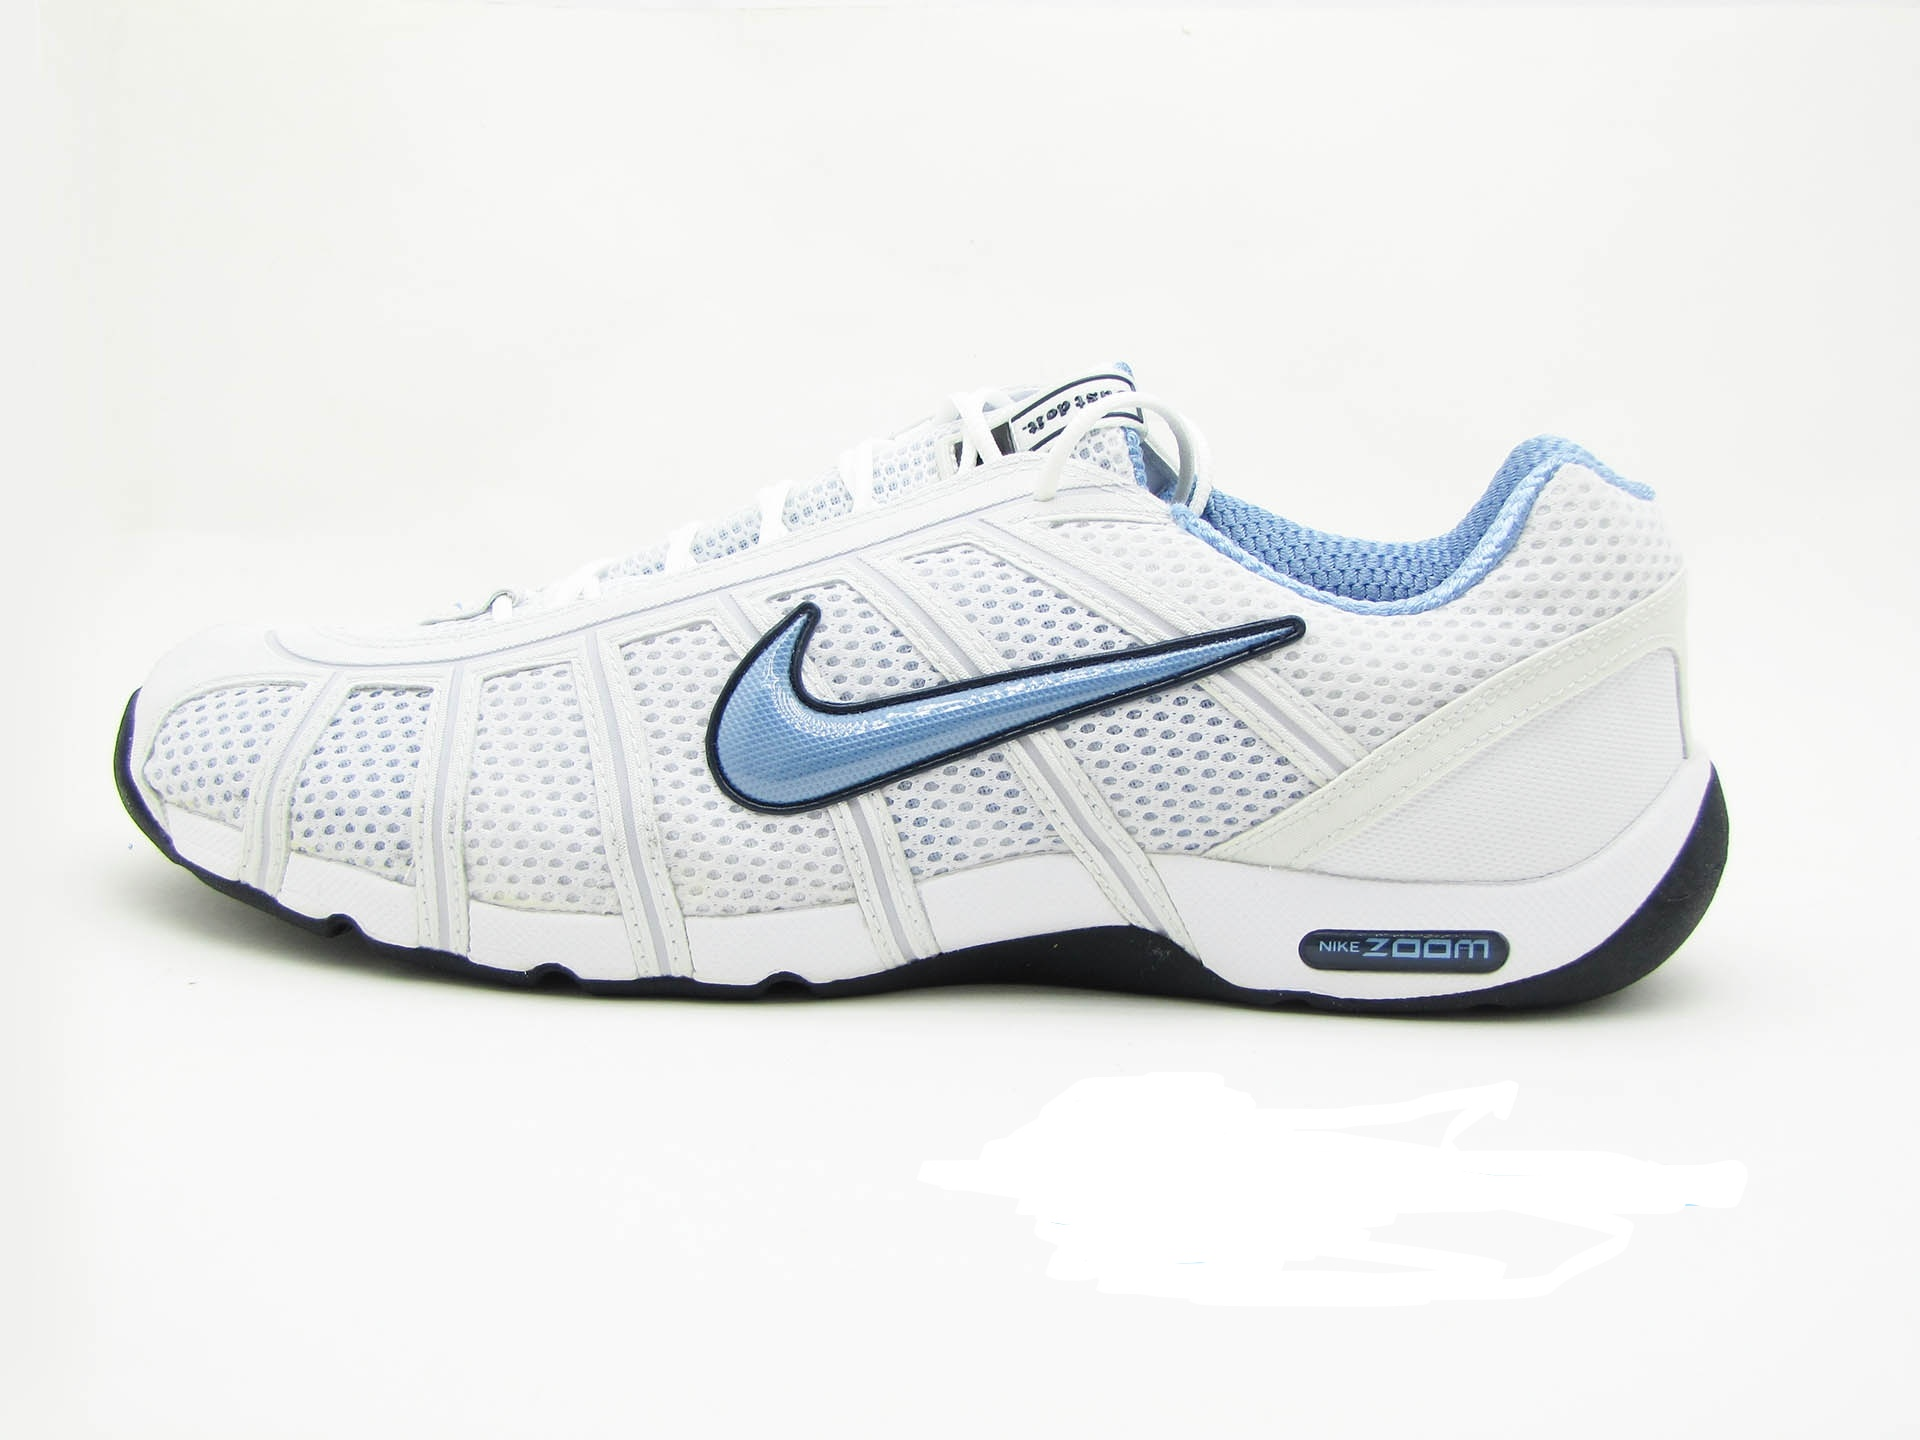 InkedОбувь фехтовальная NIKE Air Zoom Fencer WHITELIGHT BLUE OBSIDIAN 144